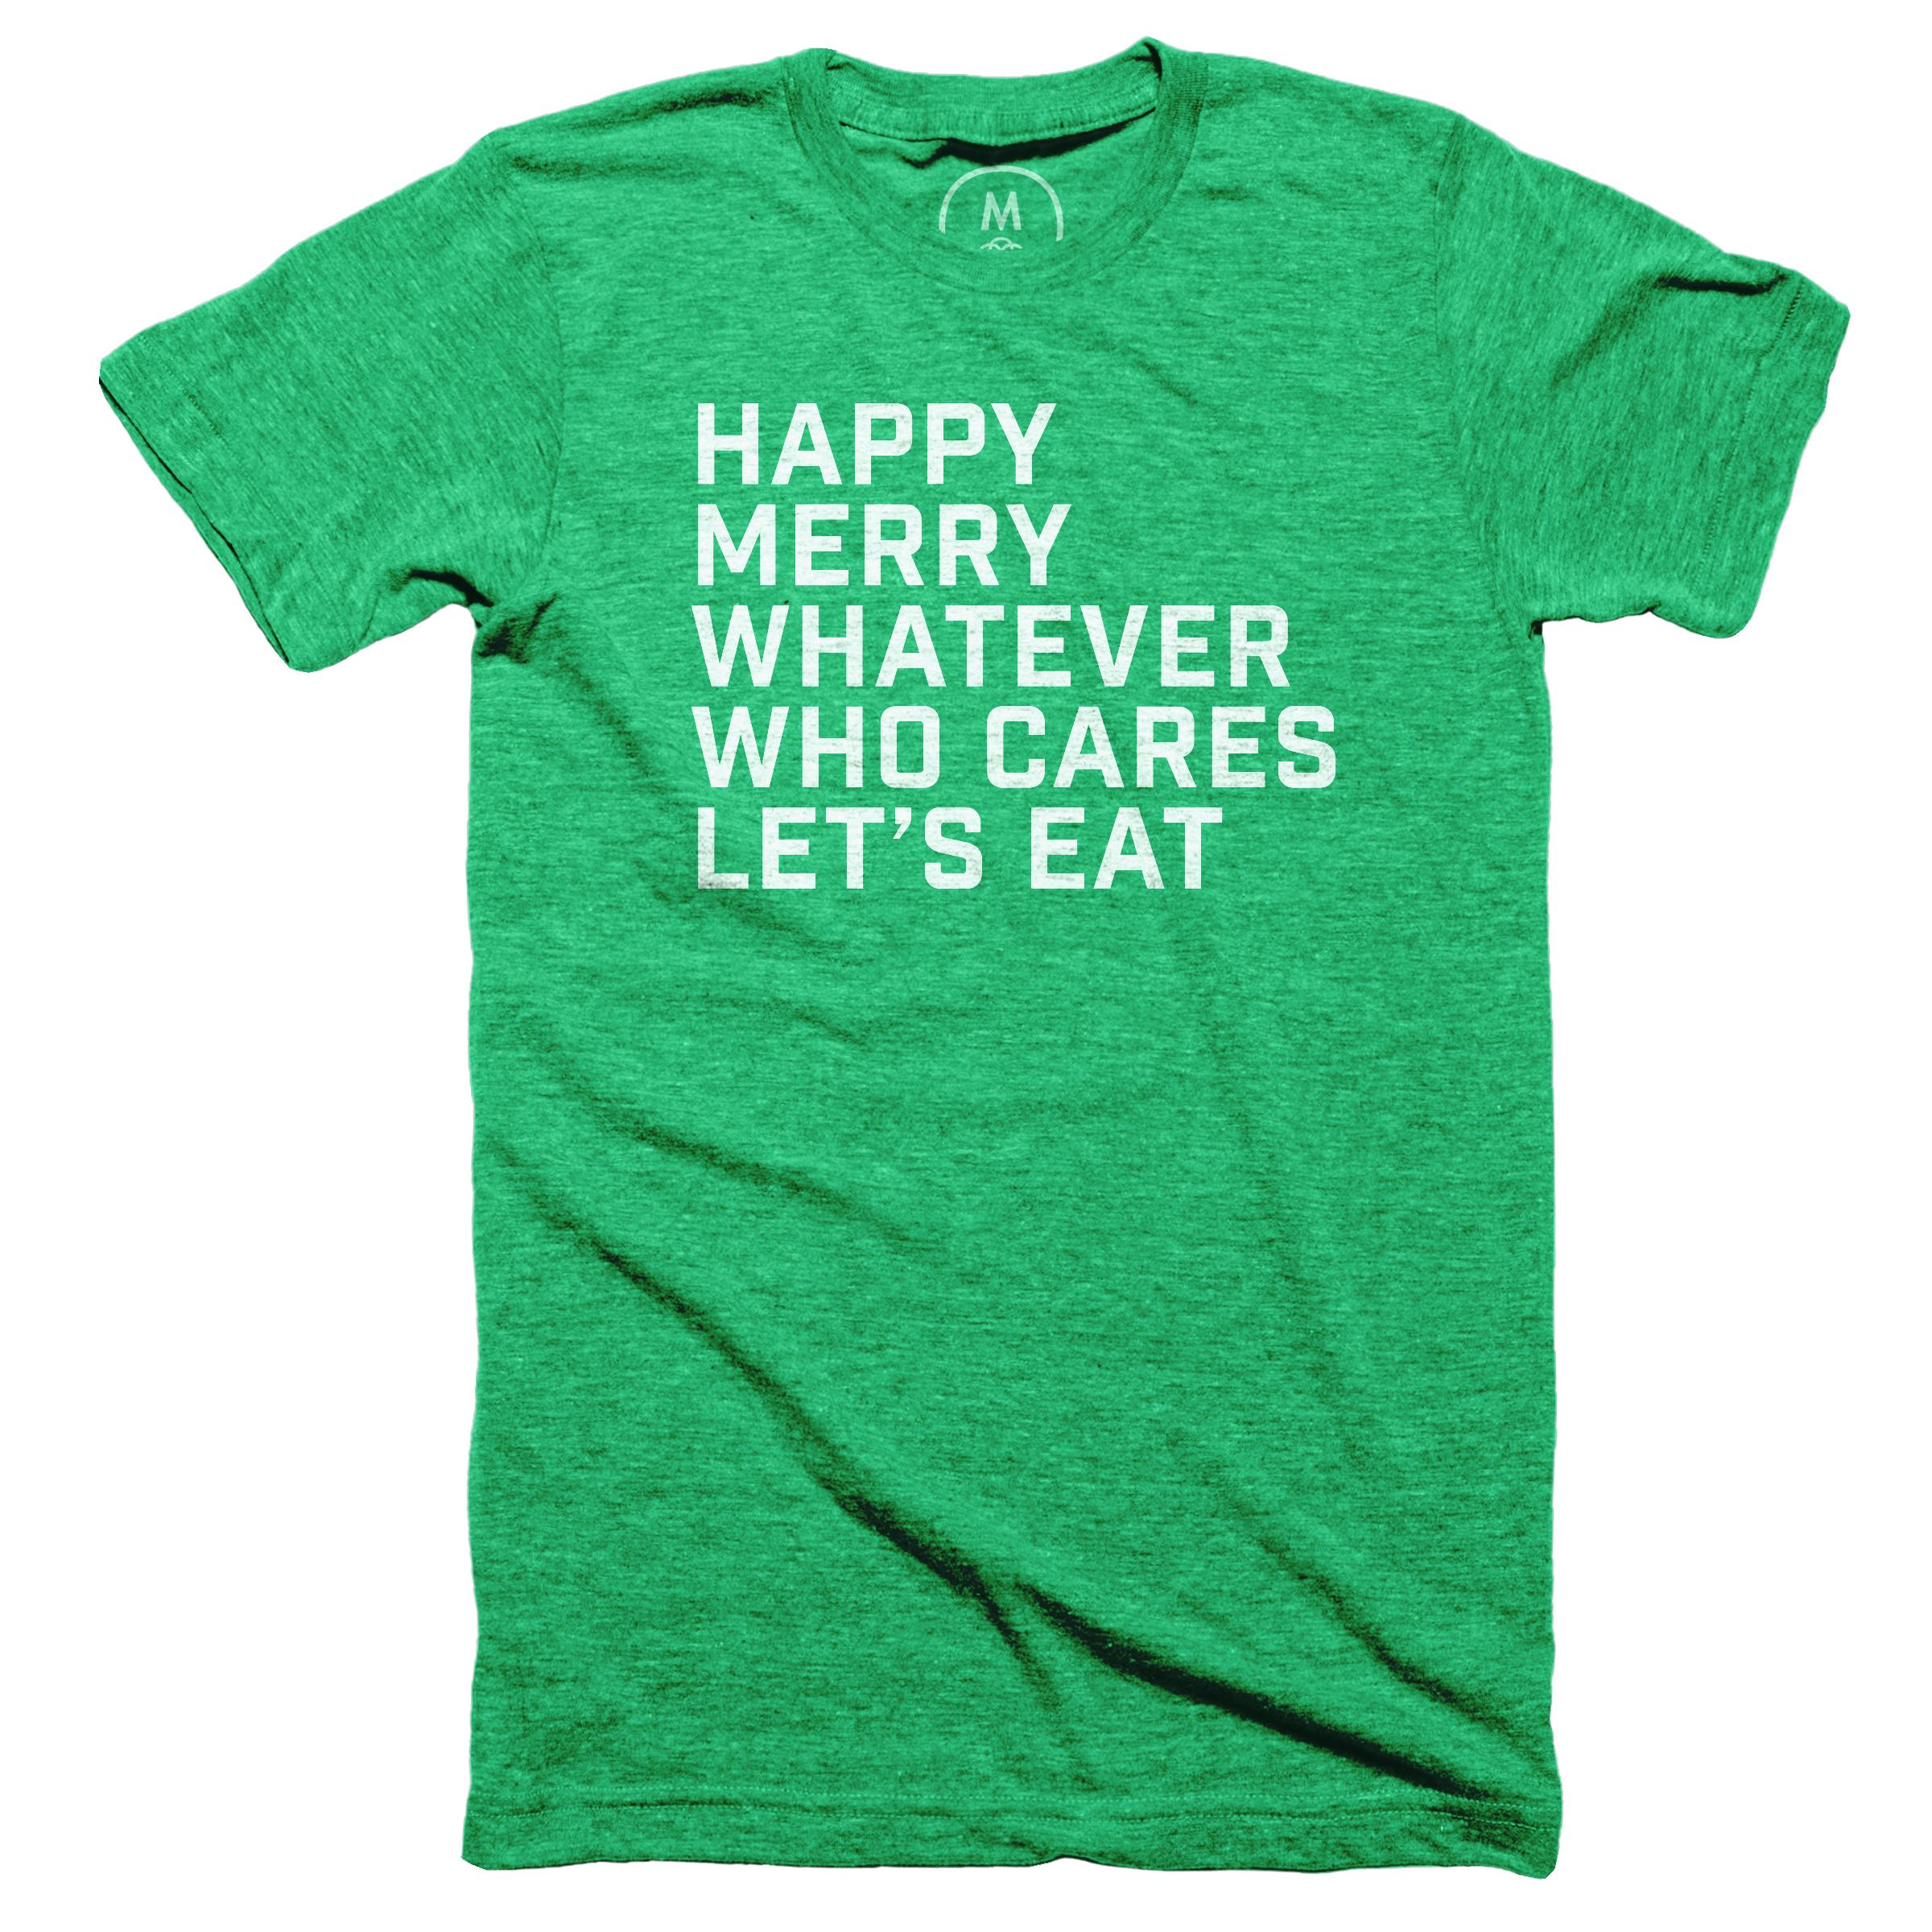 Let's Eat Envy (Men's)